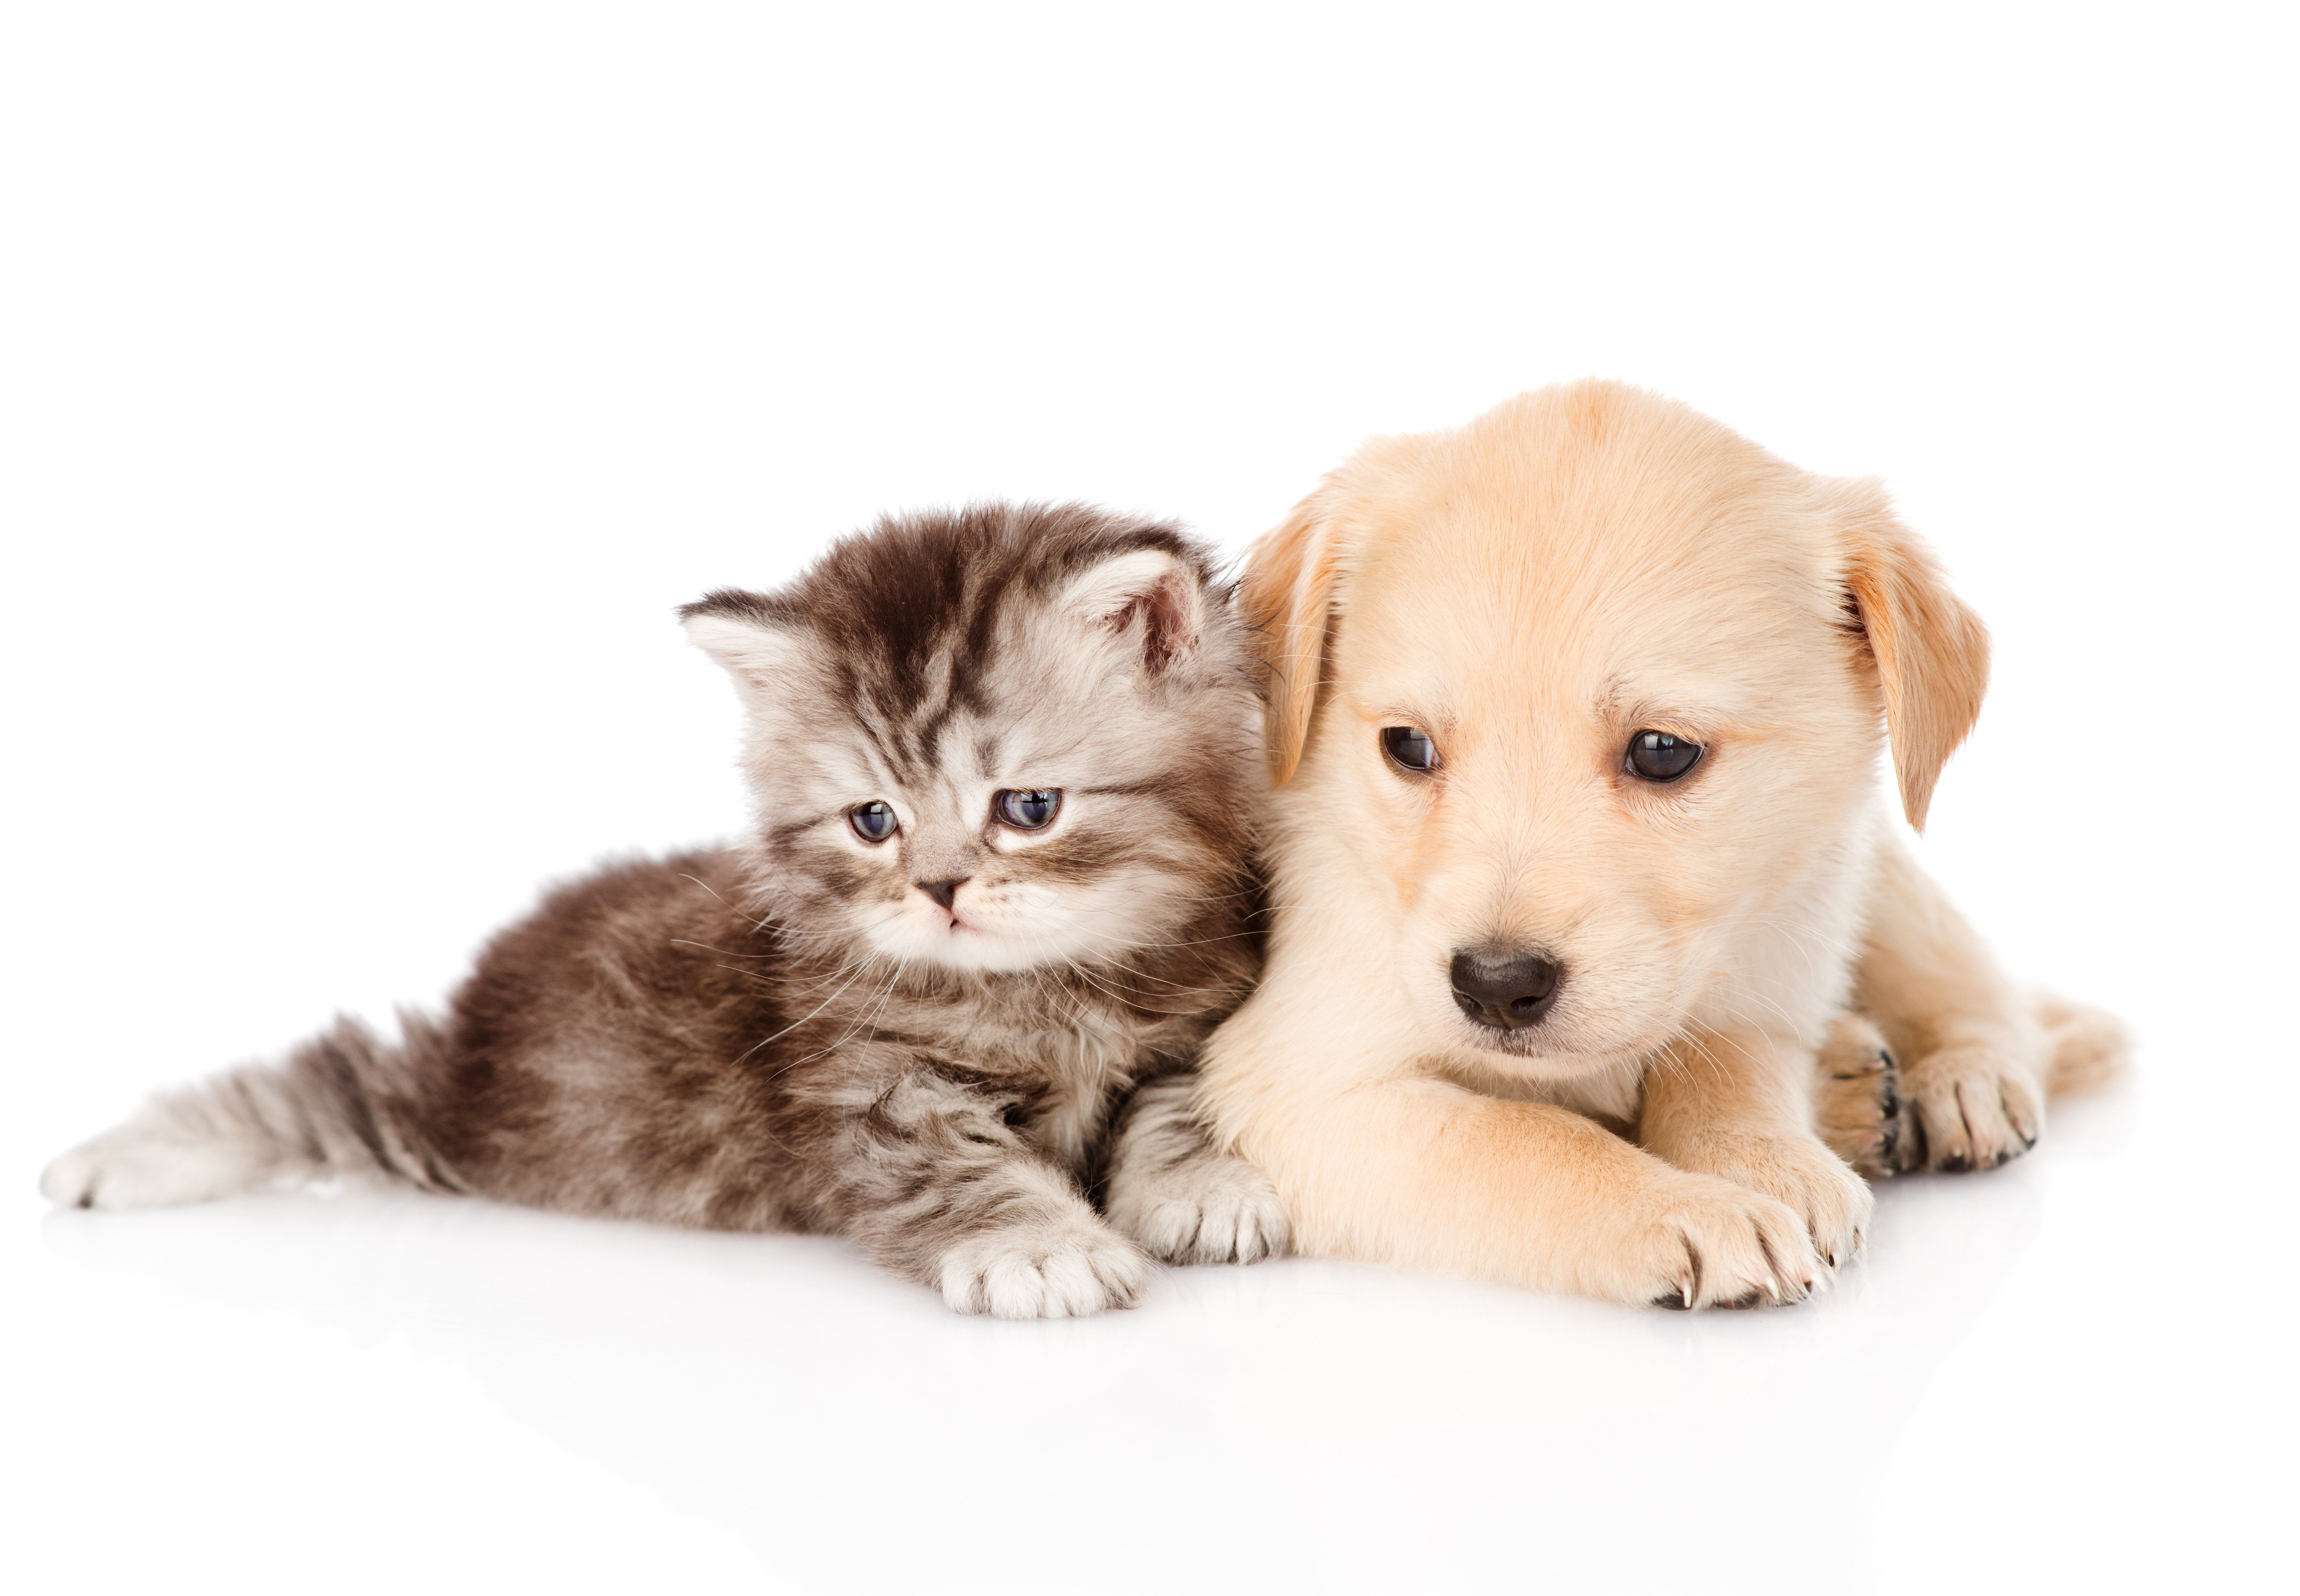 Cat And Dog Desktop Wallpapers Top Free Cat And Dog Desktop Backgrounds Wallpaperaccess